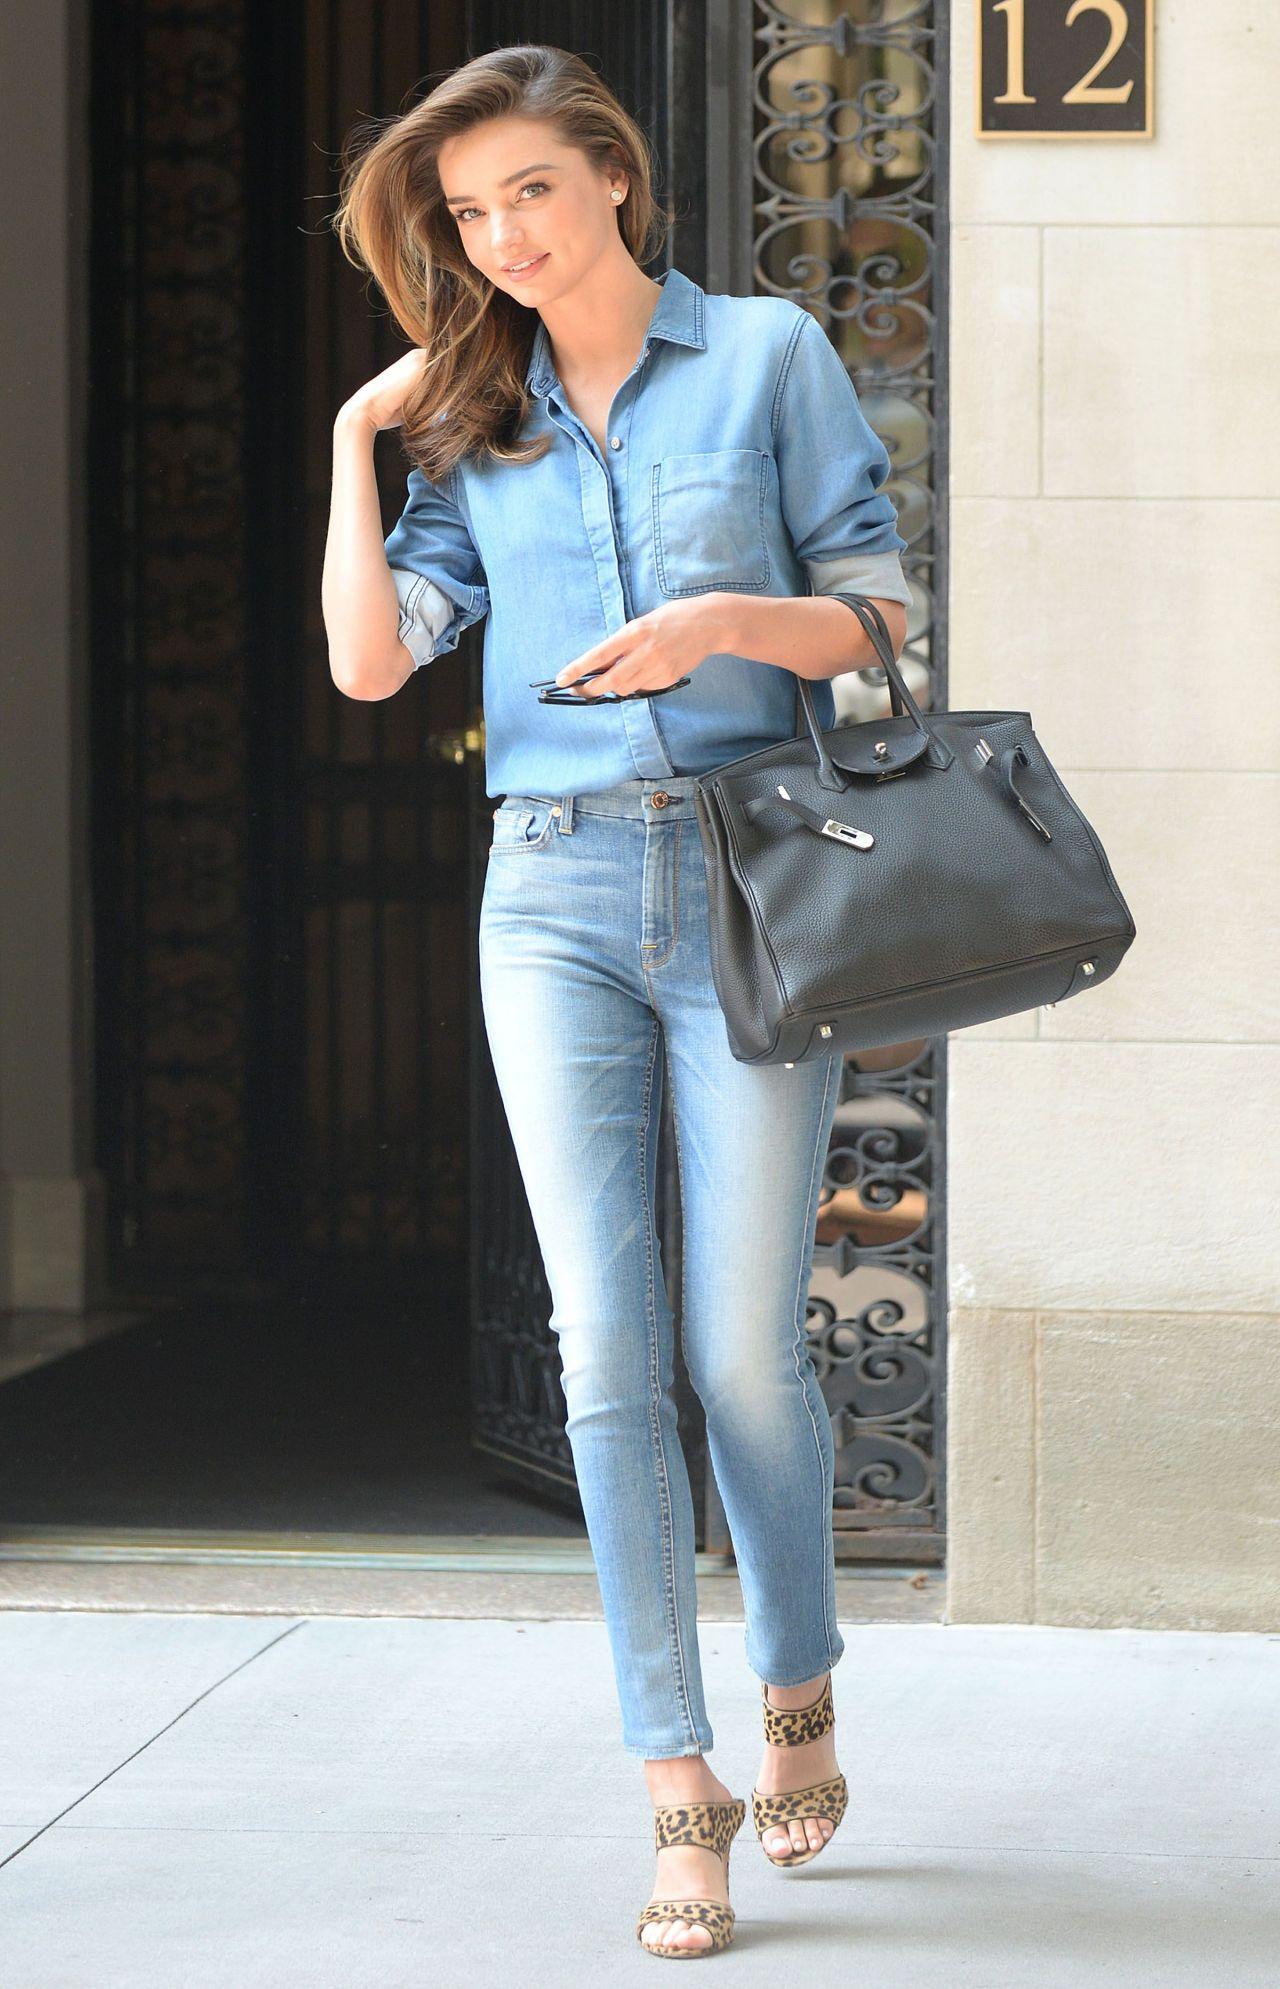 miranda kerr in jeans out in new york city  july 2014